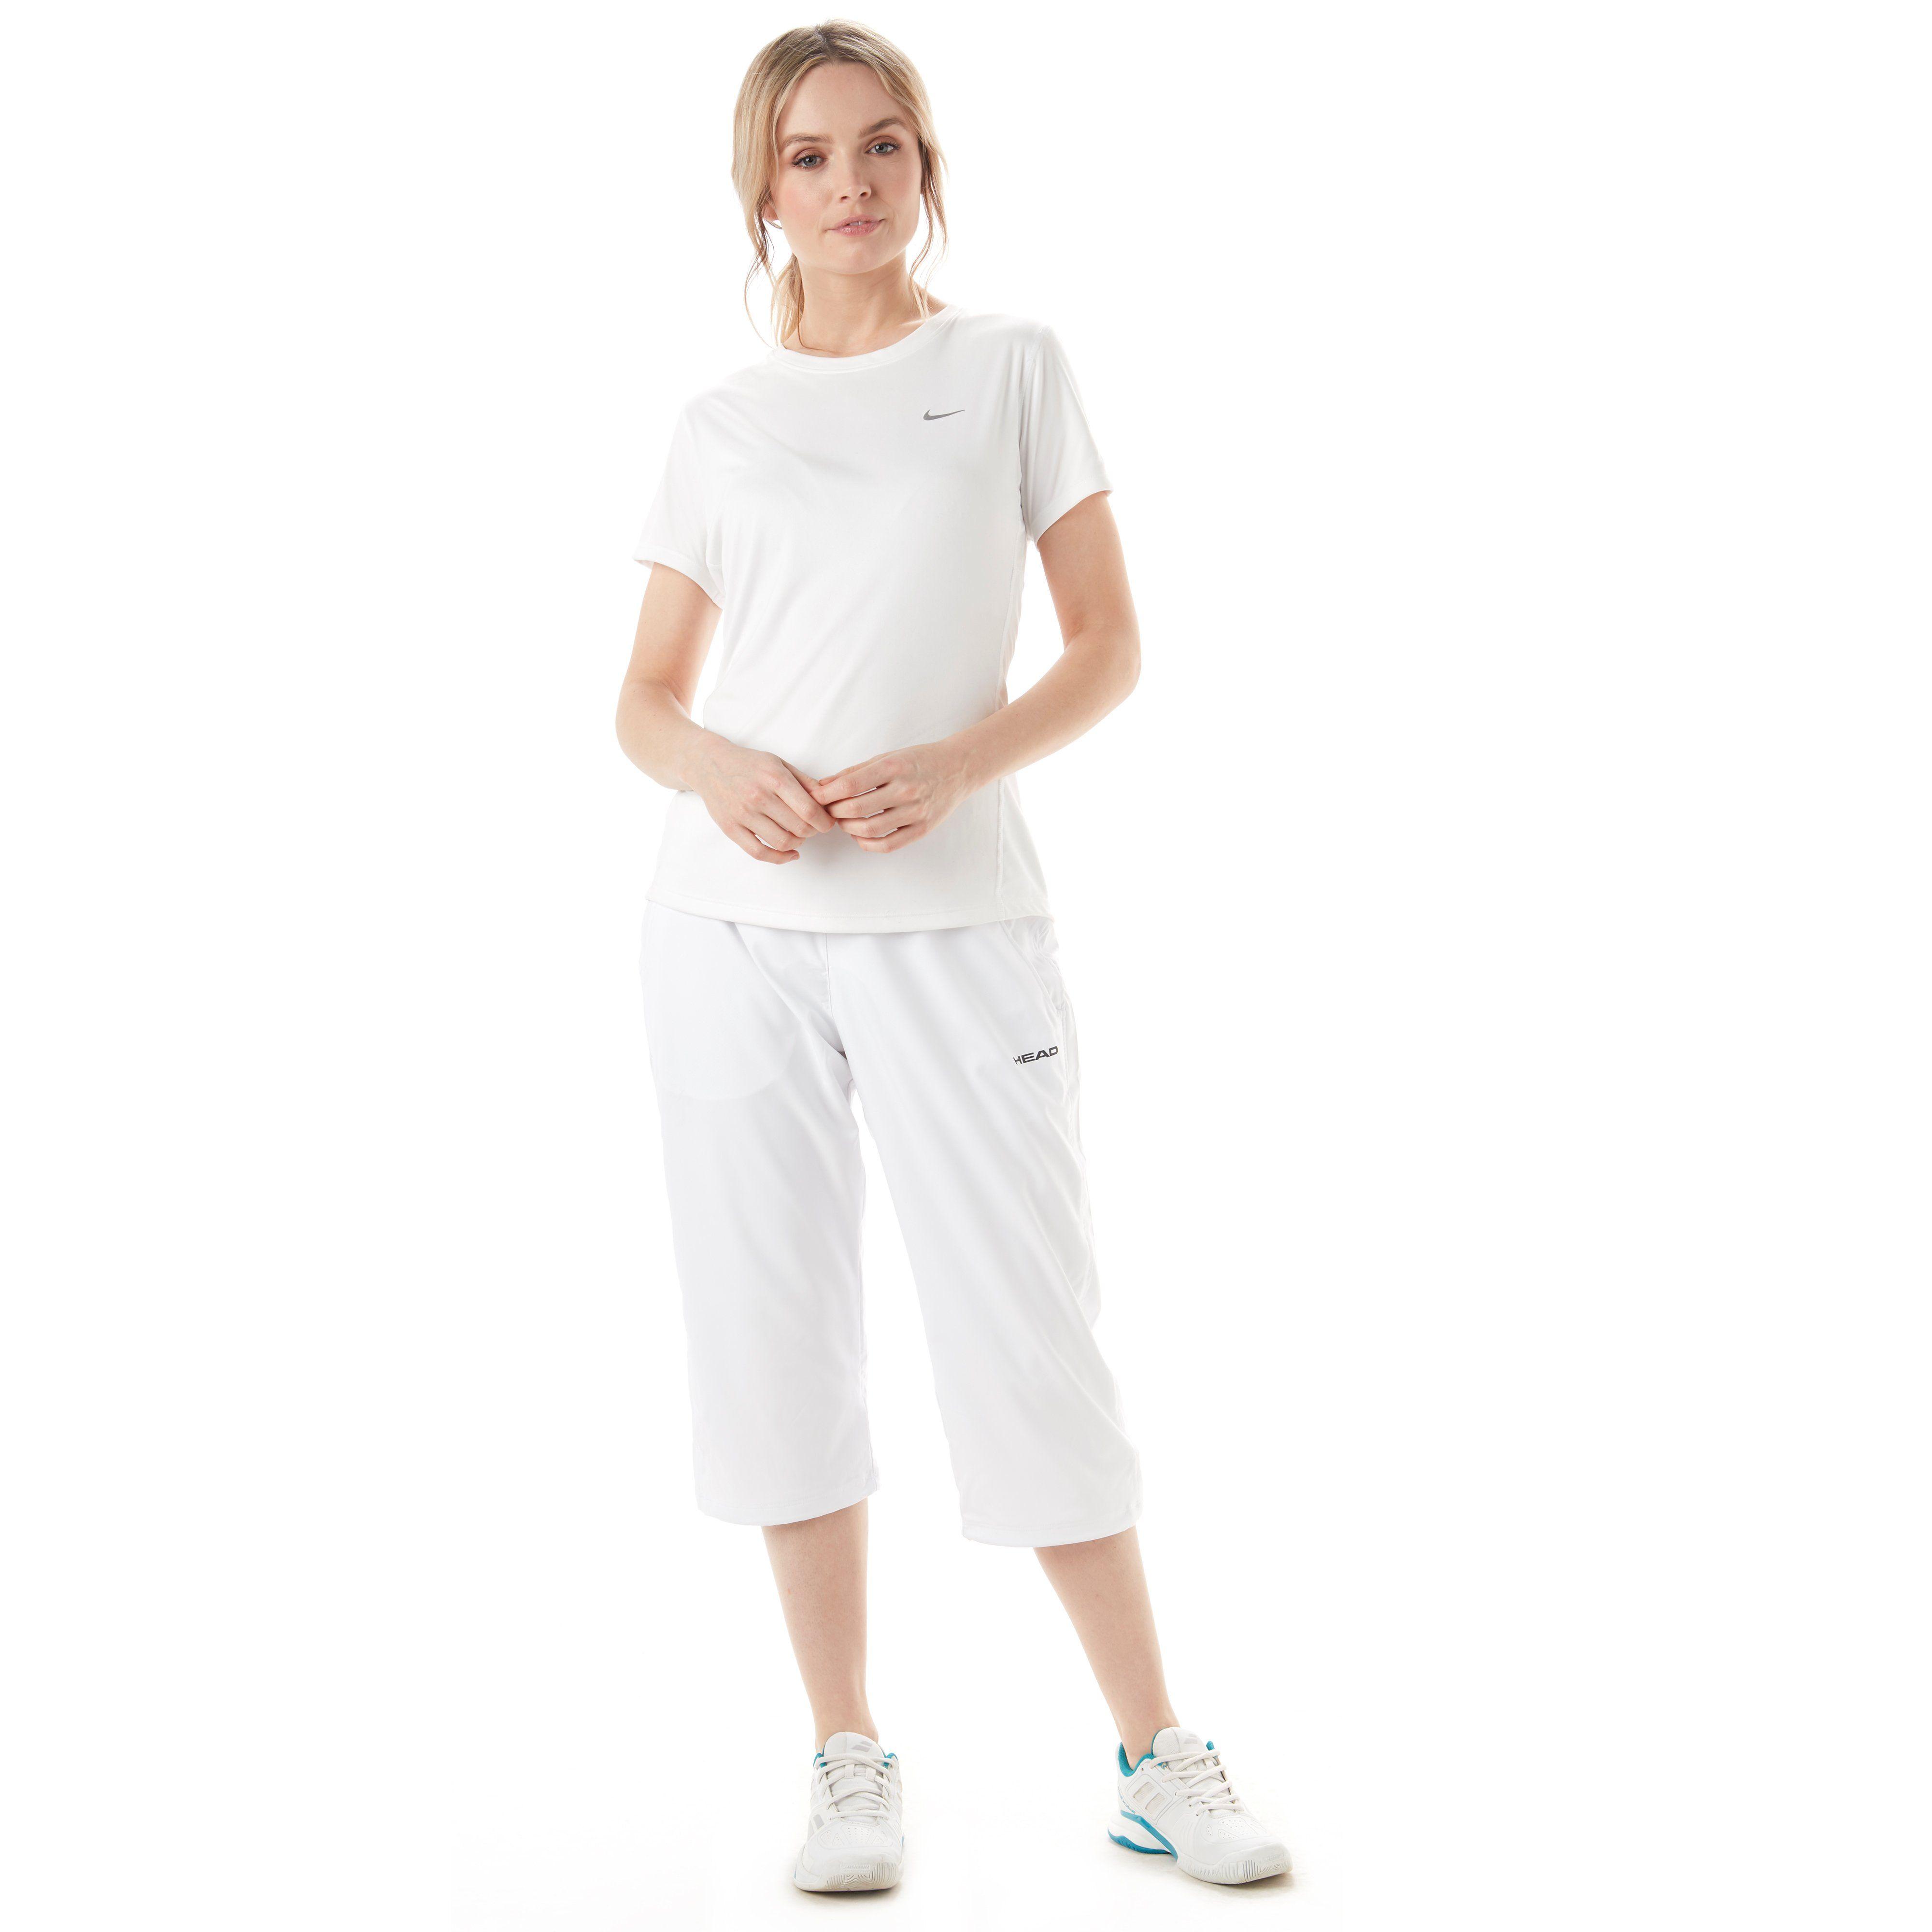 Head Club Capri Women's Pants